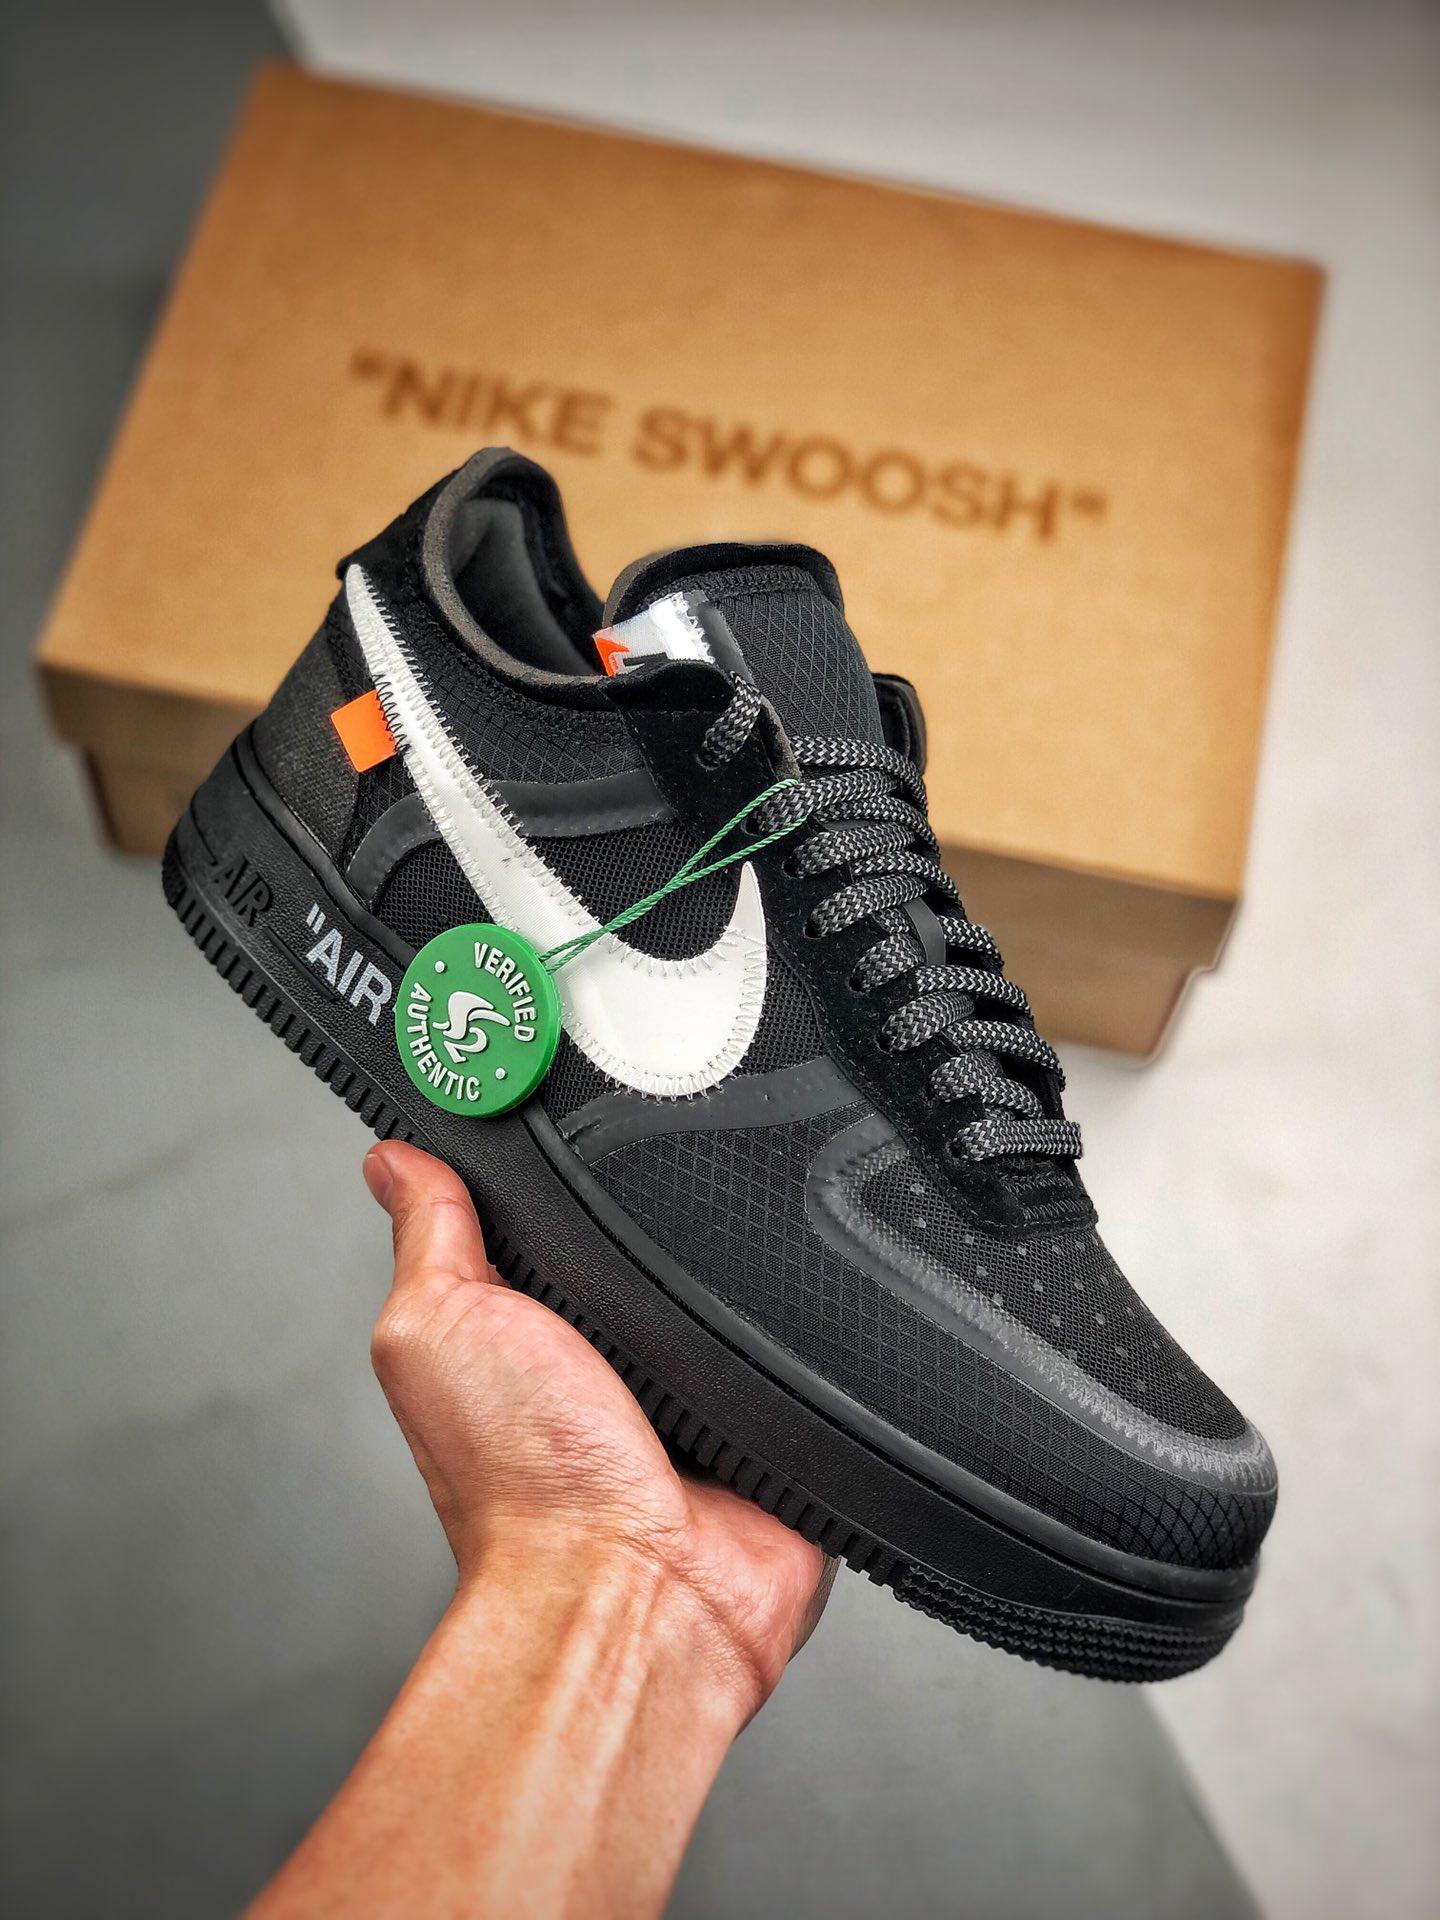 "S2原装AF1 Off-White x Nike Air Force 1 ""Black""韩国进口原装网纱鞋面不褶皱 正确高频及Swoosh材质 OW黑白配色 AO4606-001_y3 哪些 巴斯夫"